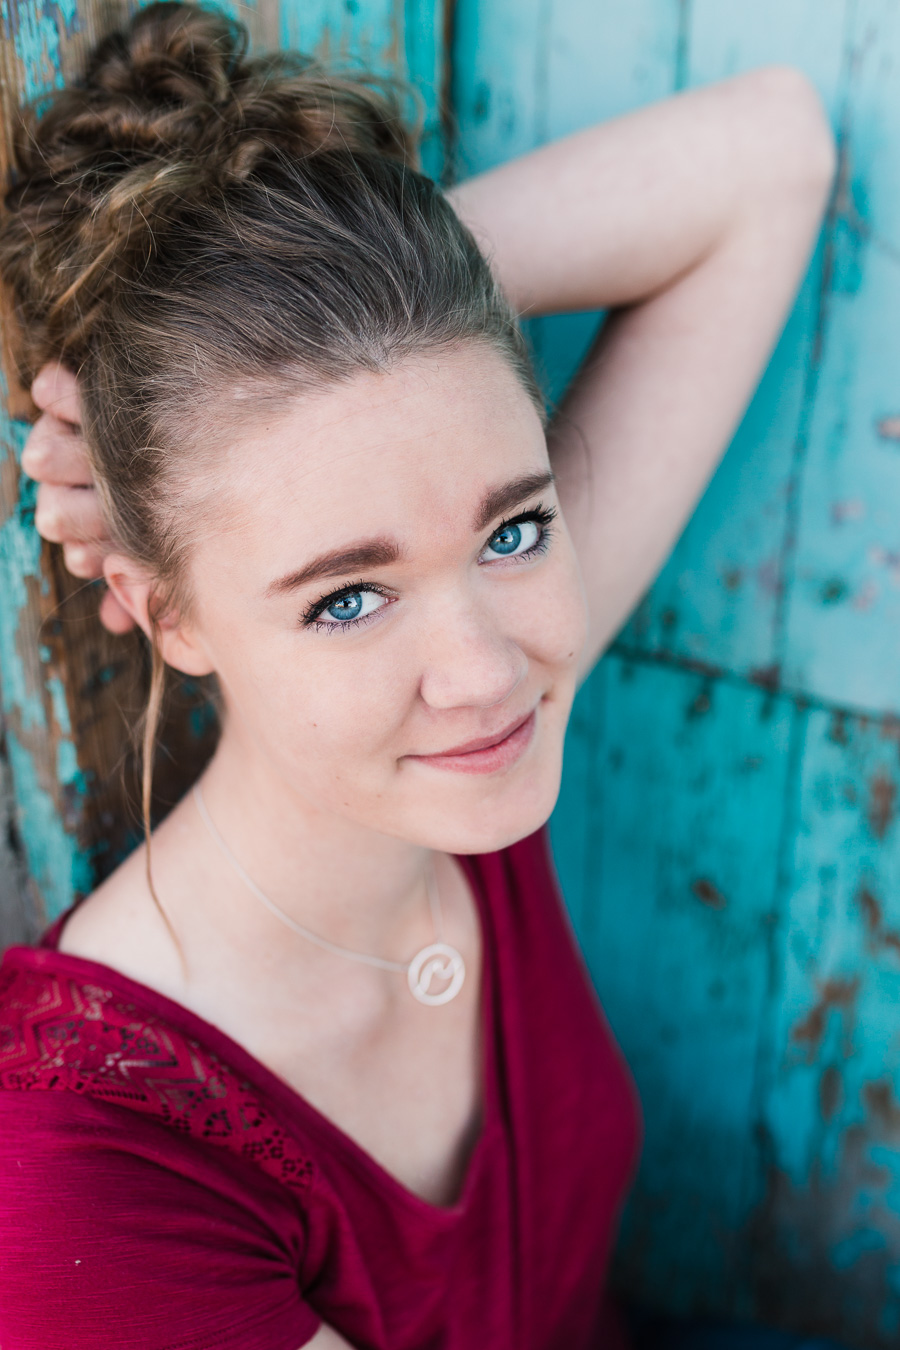 Zoey: A Beautiful and Fun High School Senior